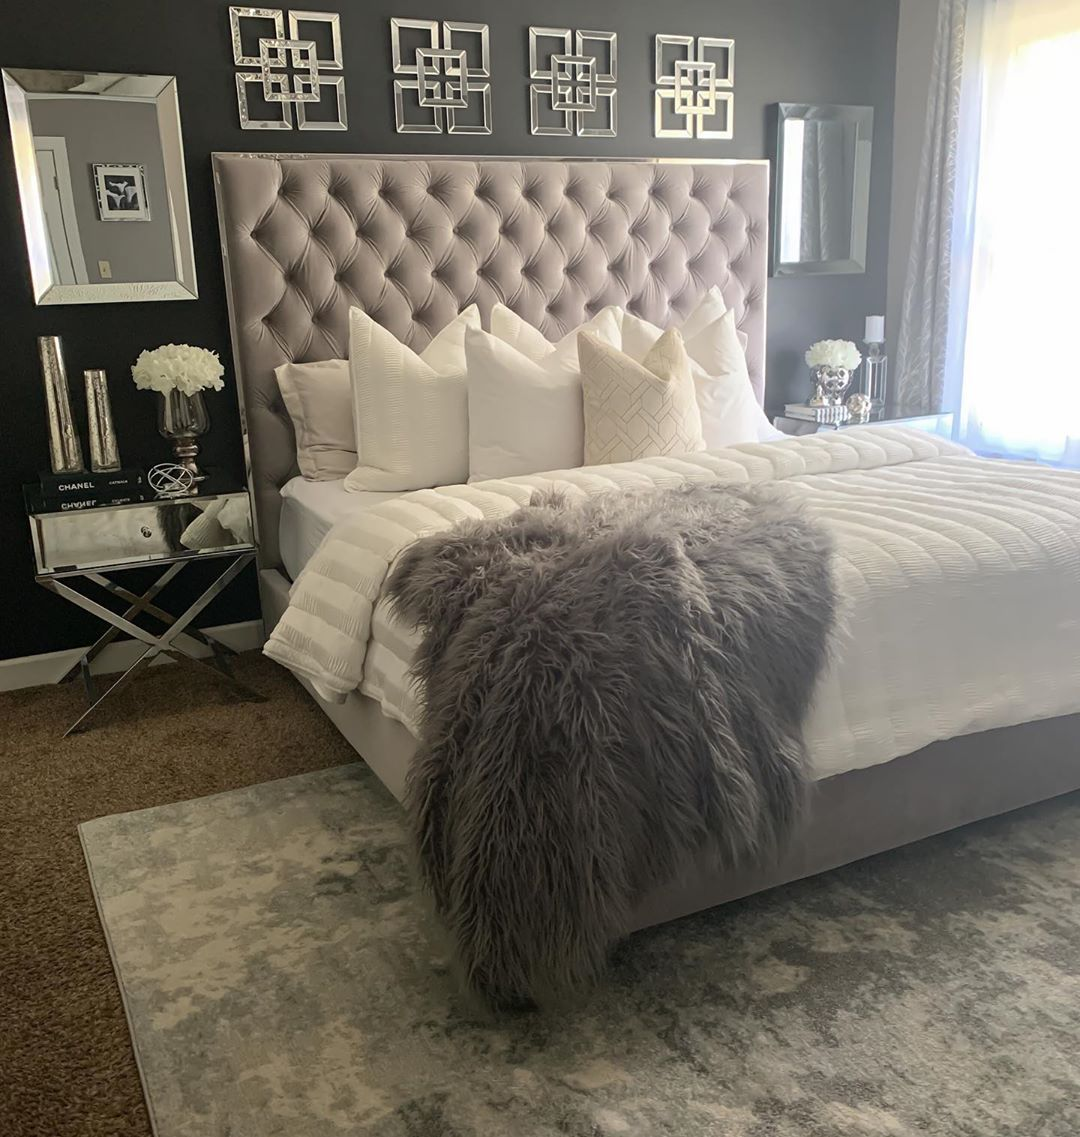 Stunning 20 Beegcom Home Decor Appleton Wi In 2020 Top Interior Design Firms Home Decor Home Decor Online